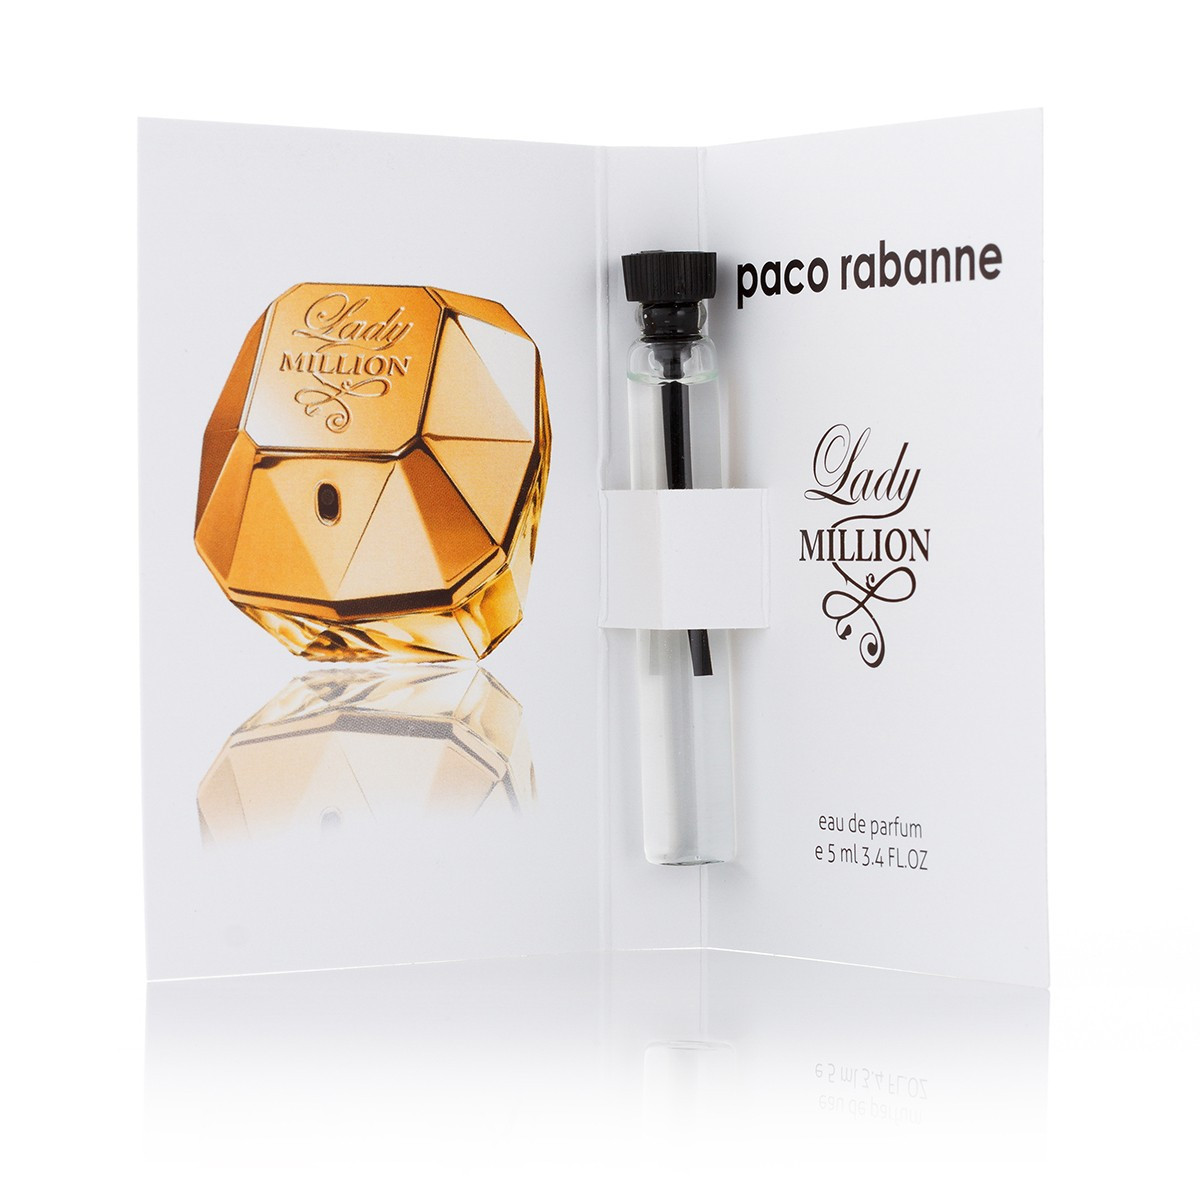 Paco Rabanne Lady Million - Sample 5ml